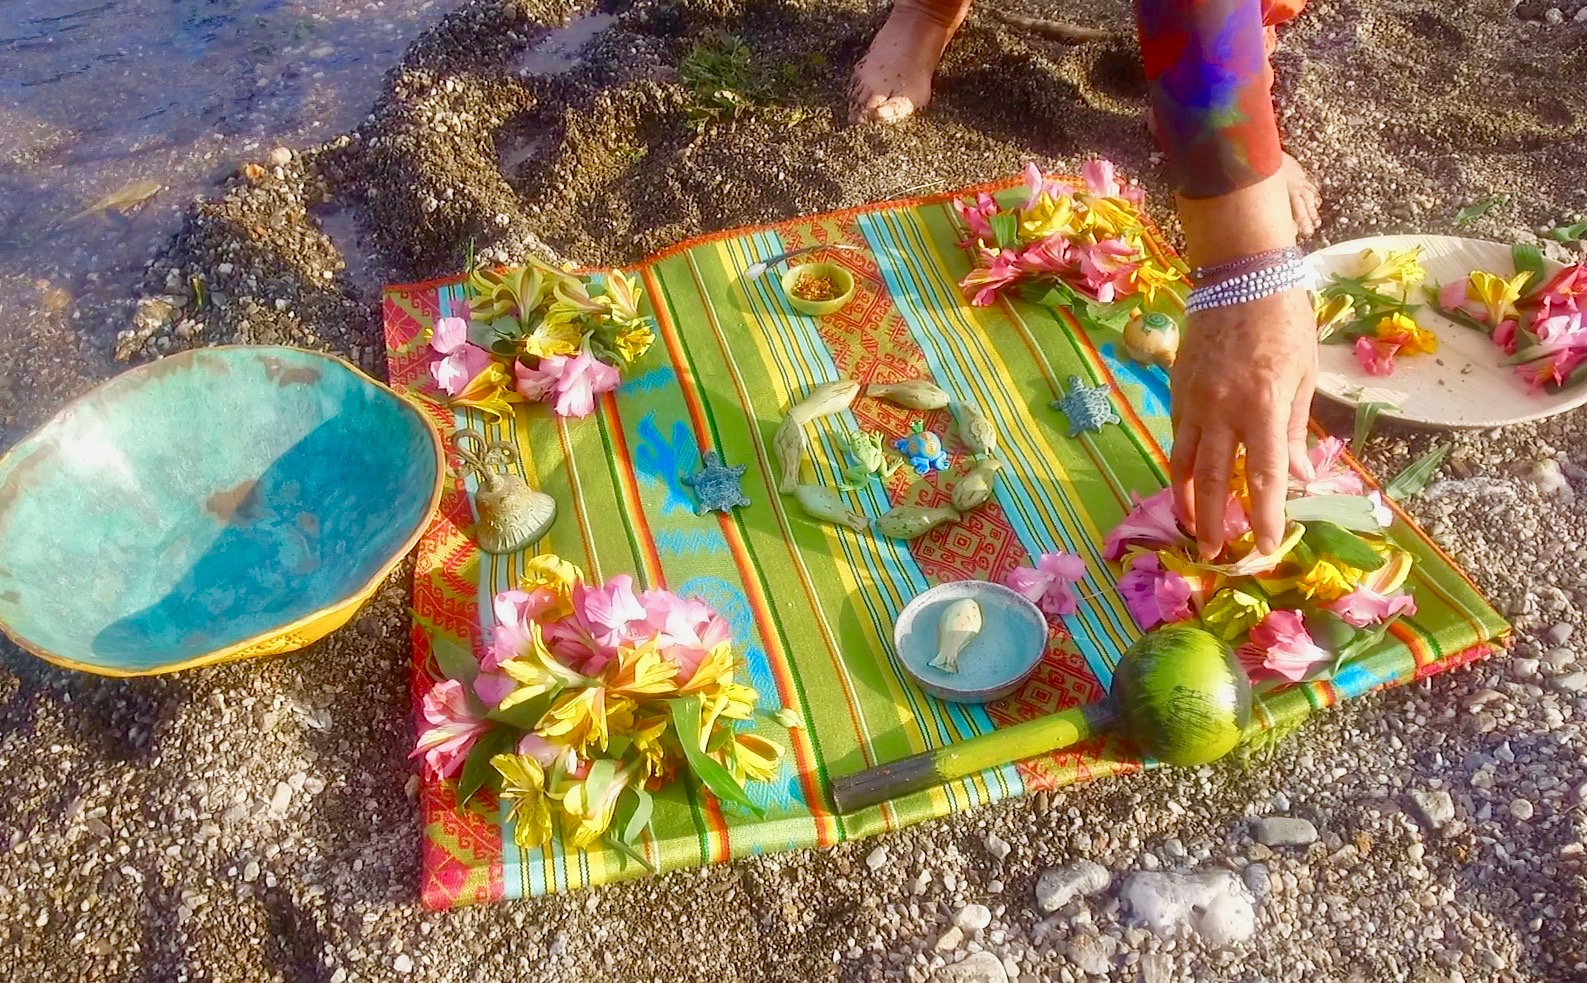 placing flowers on altar.jpg